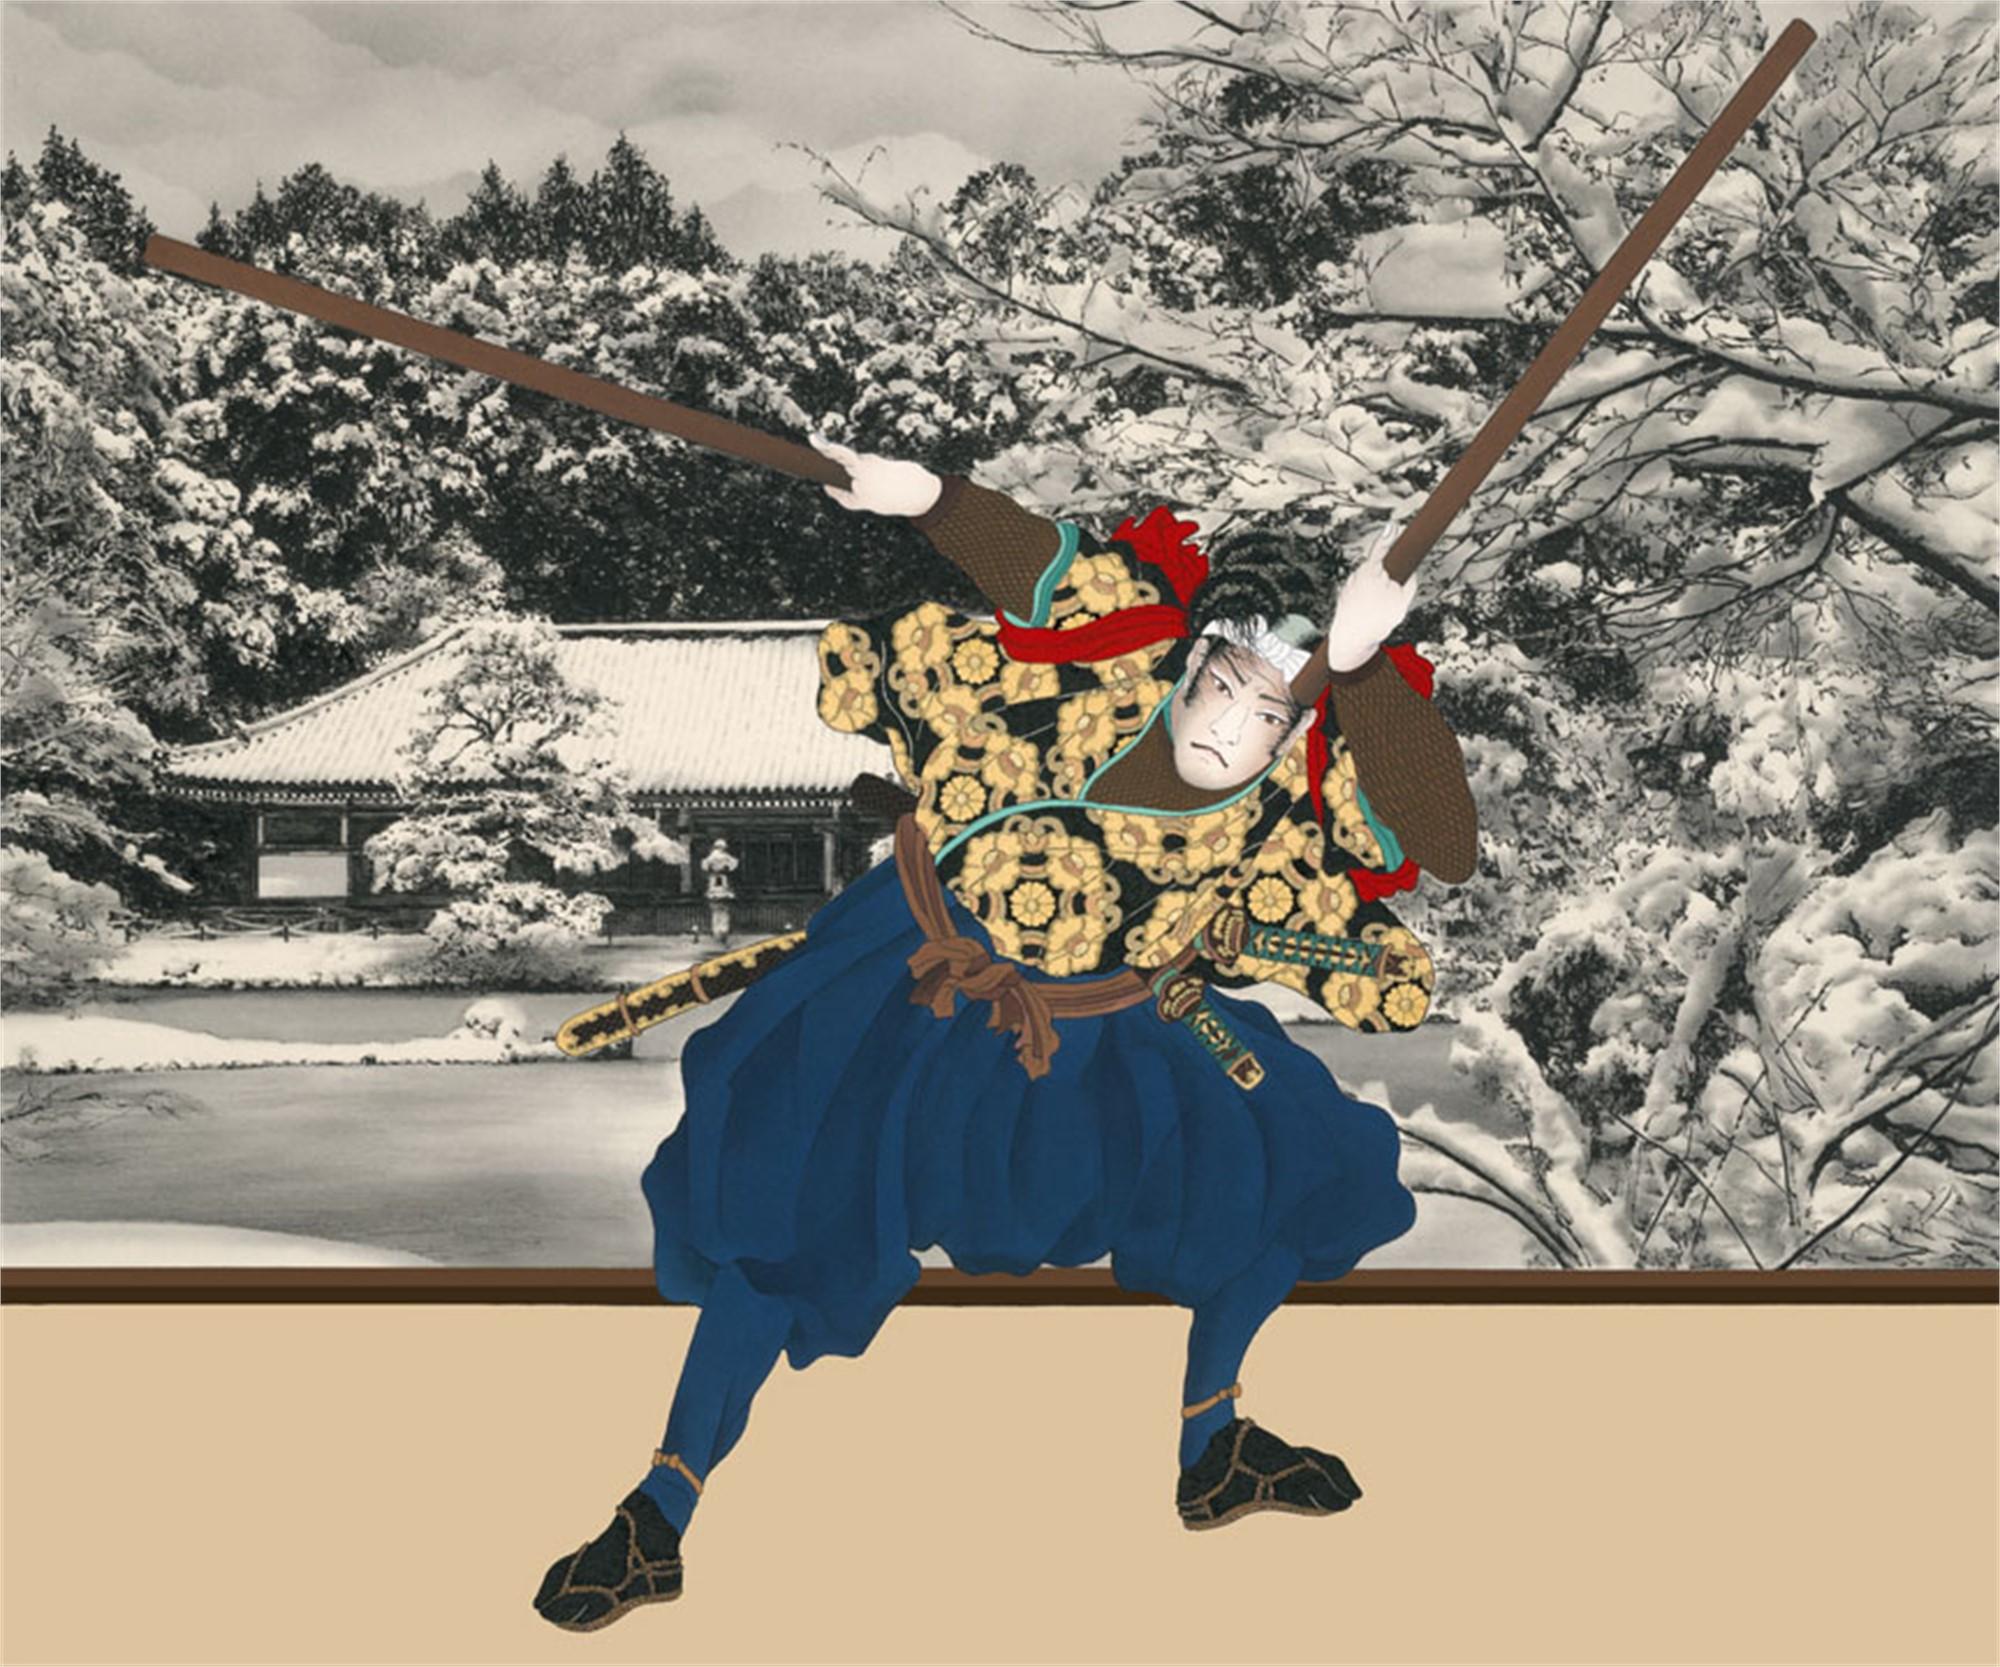 Warrior Errantry - AP by Hisashi Otsuka